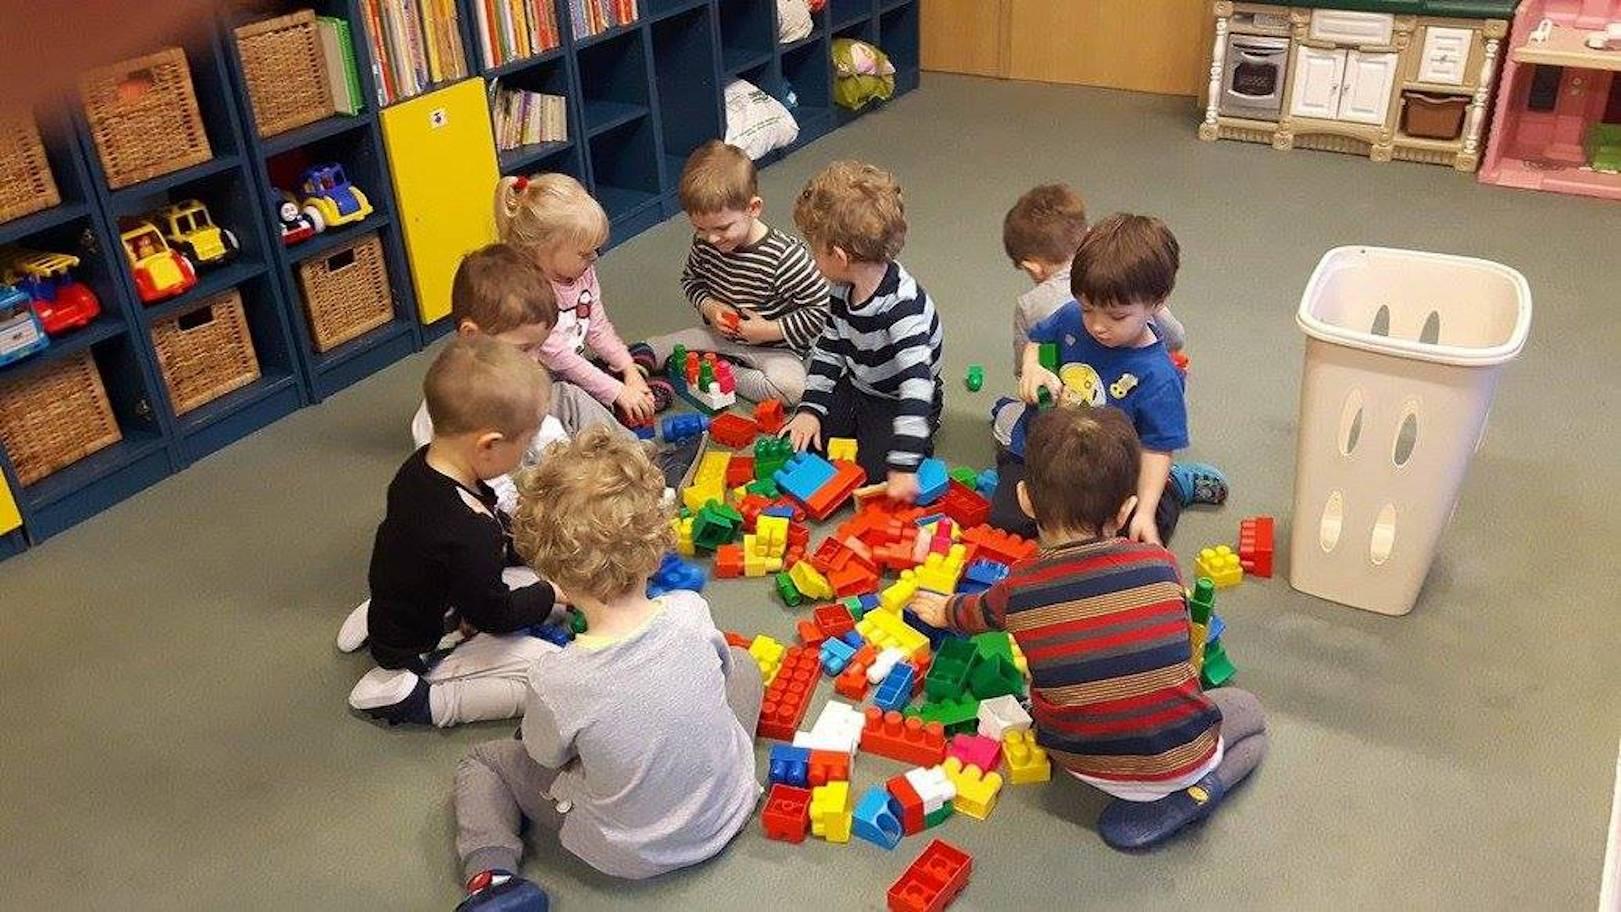 dzieci-zabawa-klocki